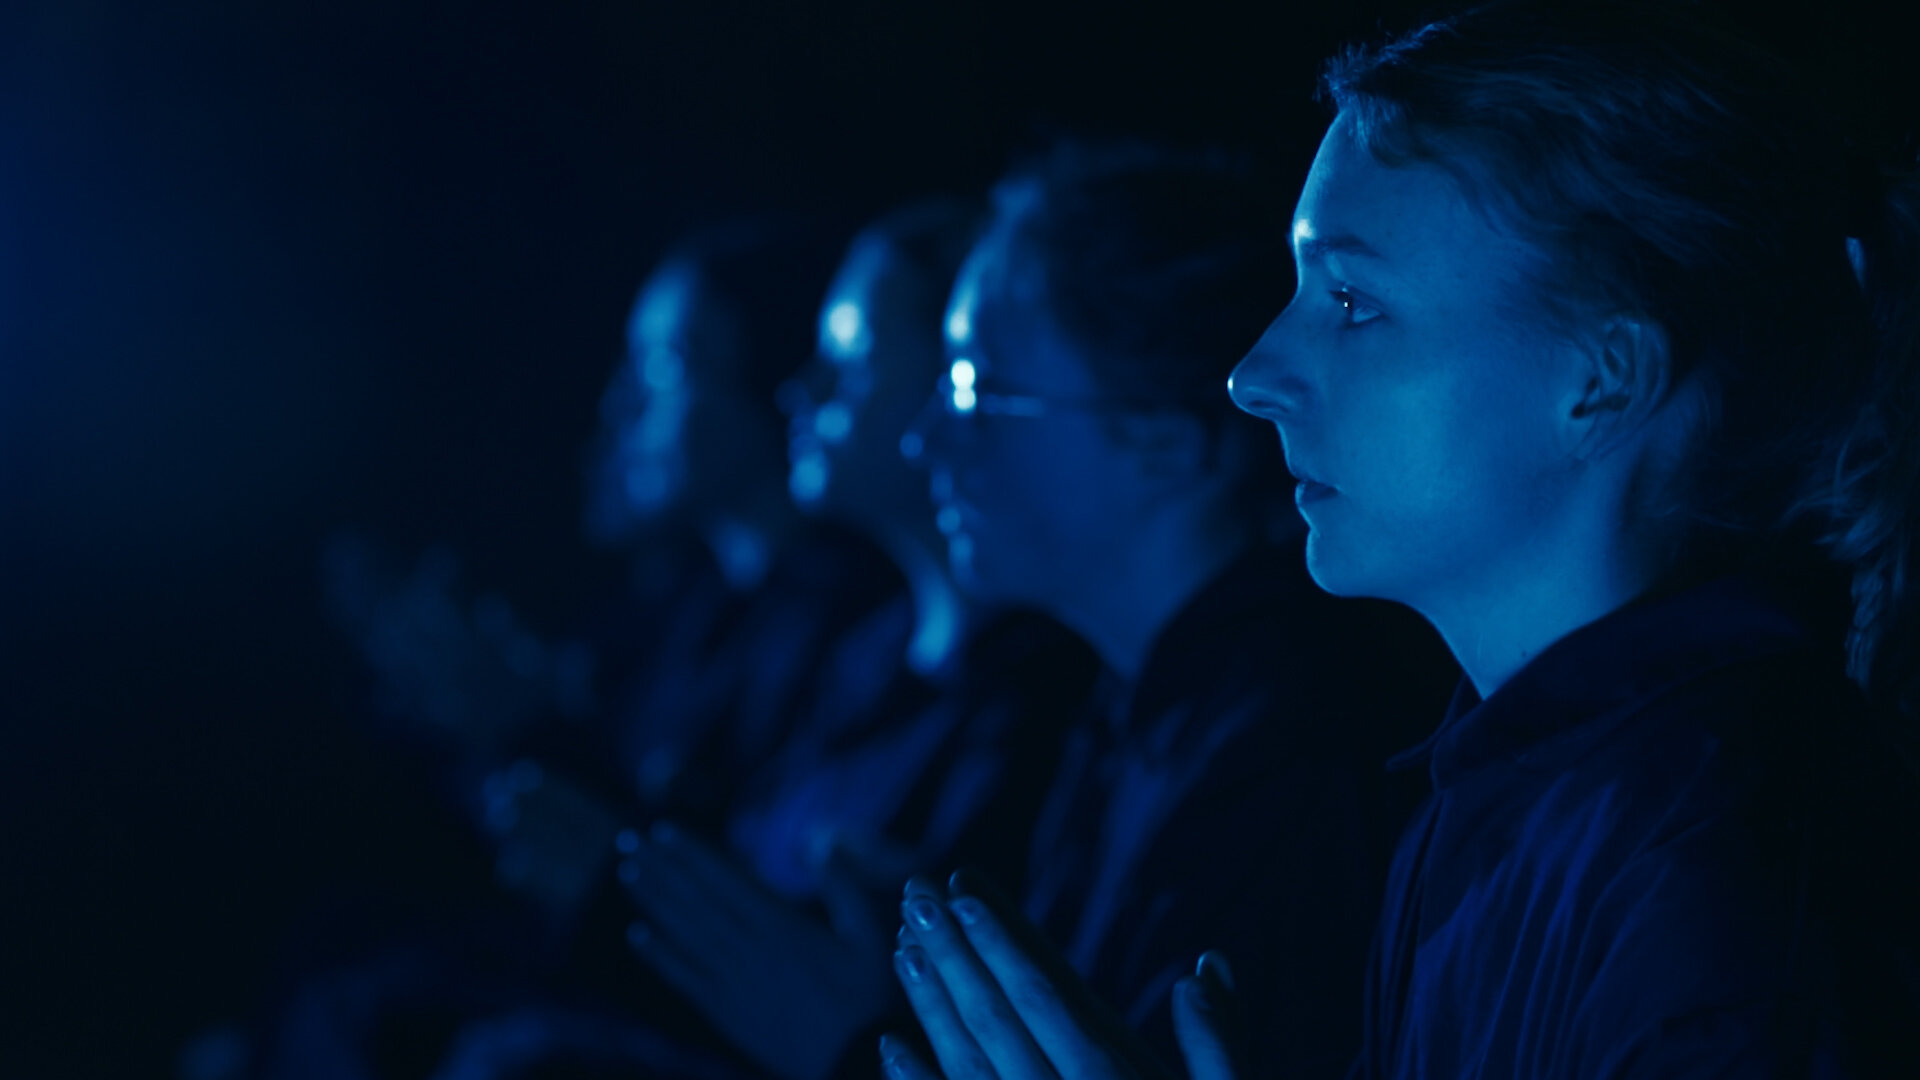 new mars v7 and row of students hands like prayer.jpg